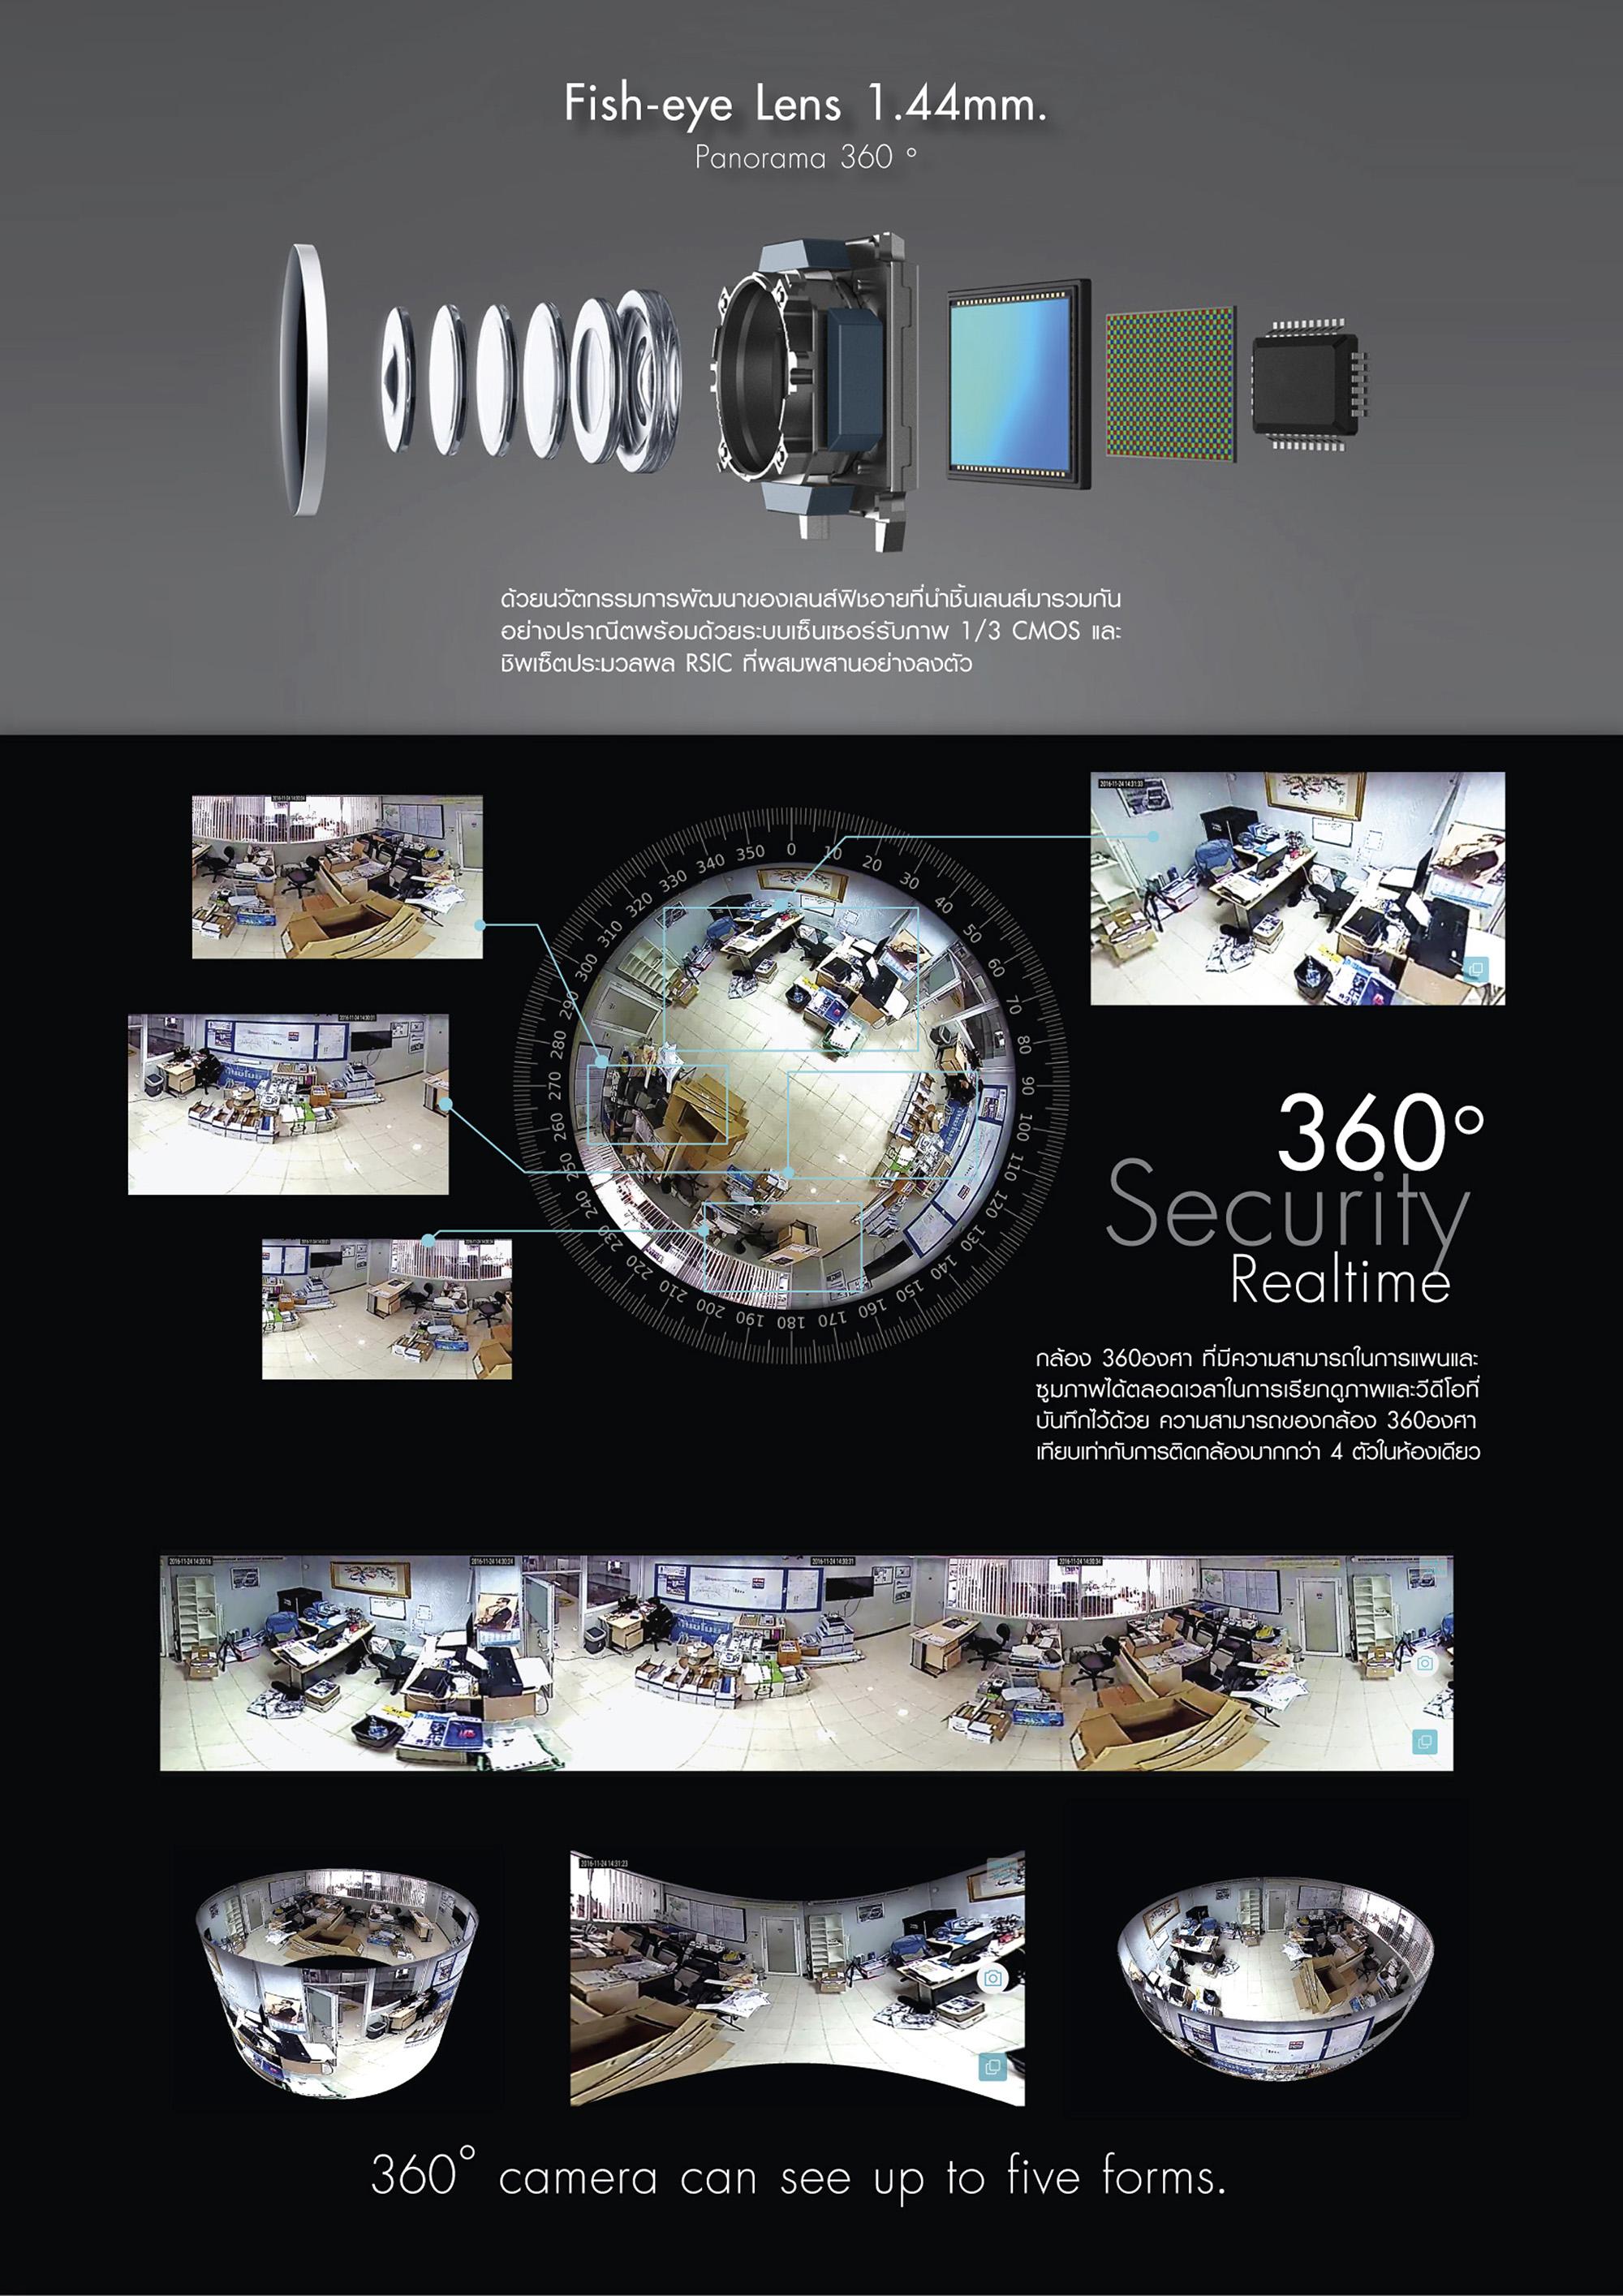 ABT SMART PANO - กล้องวงจรปิดระบบWiFi FISHEYE 360 — ABG